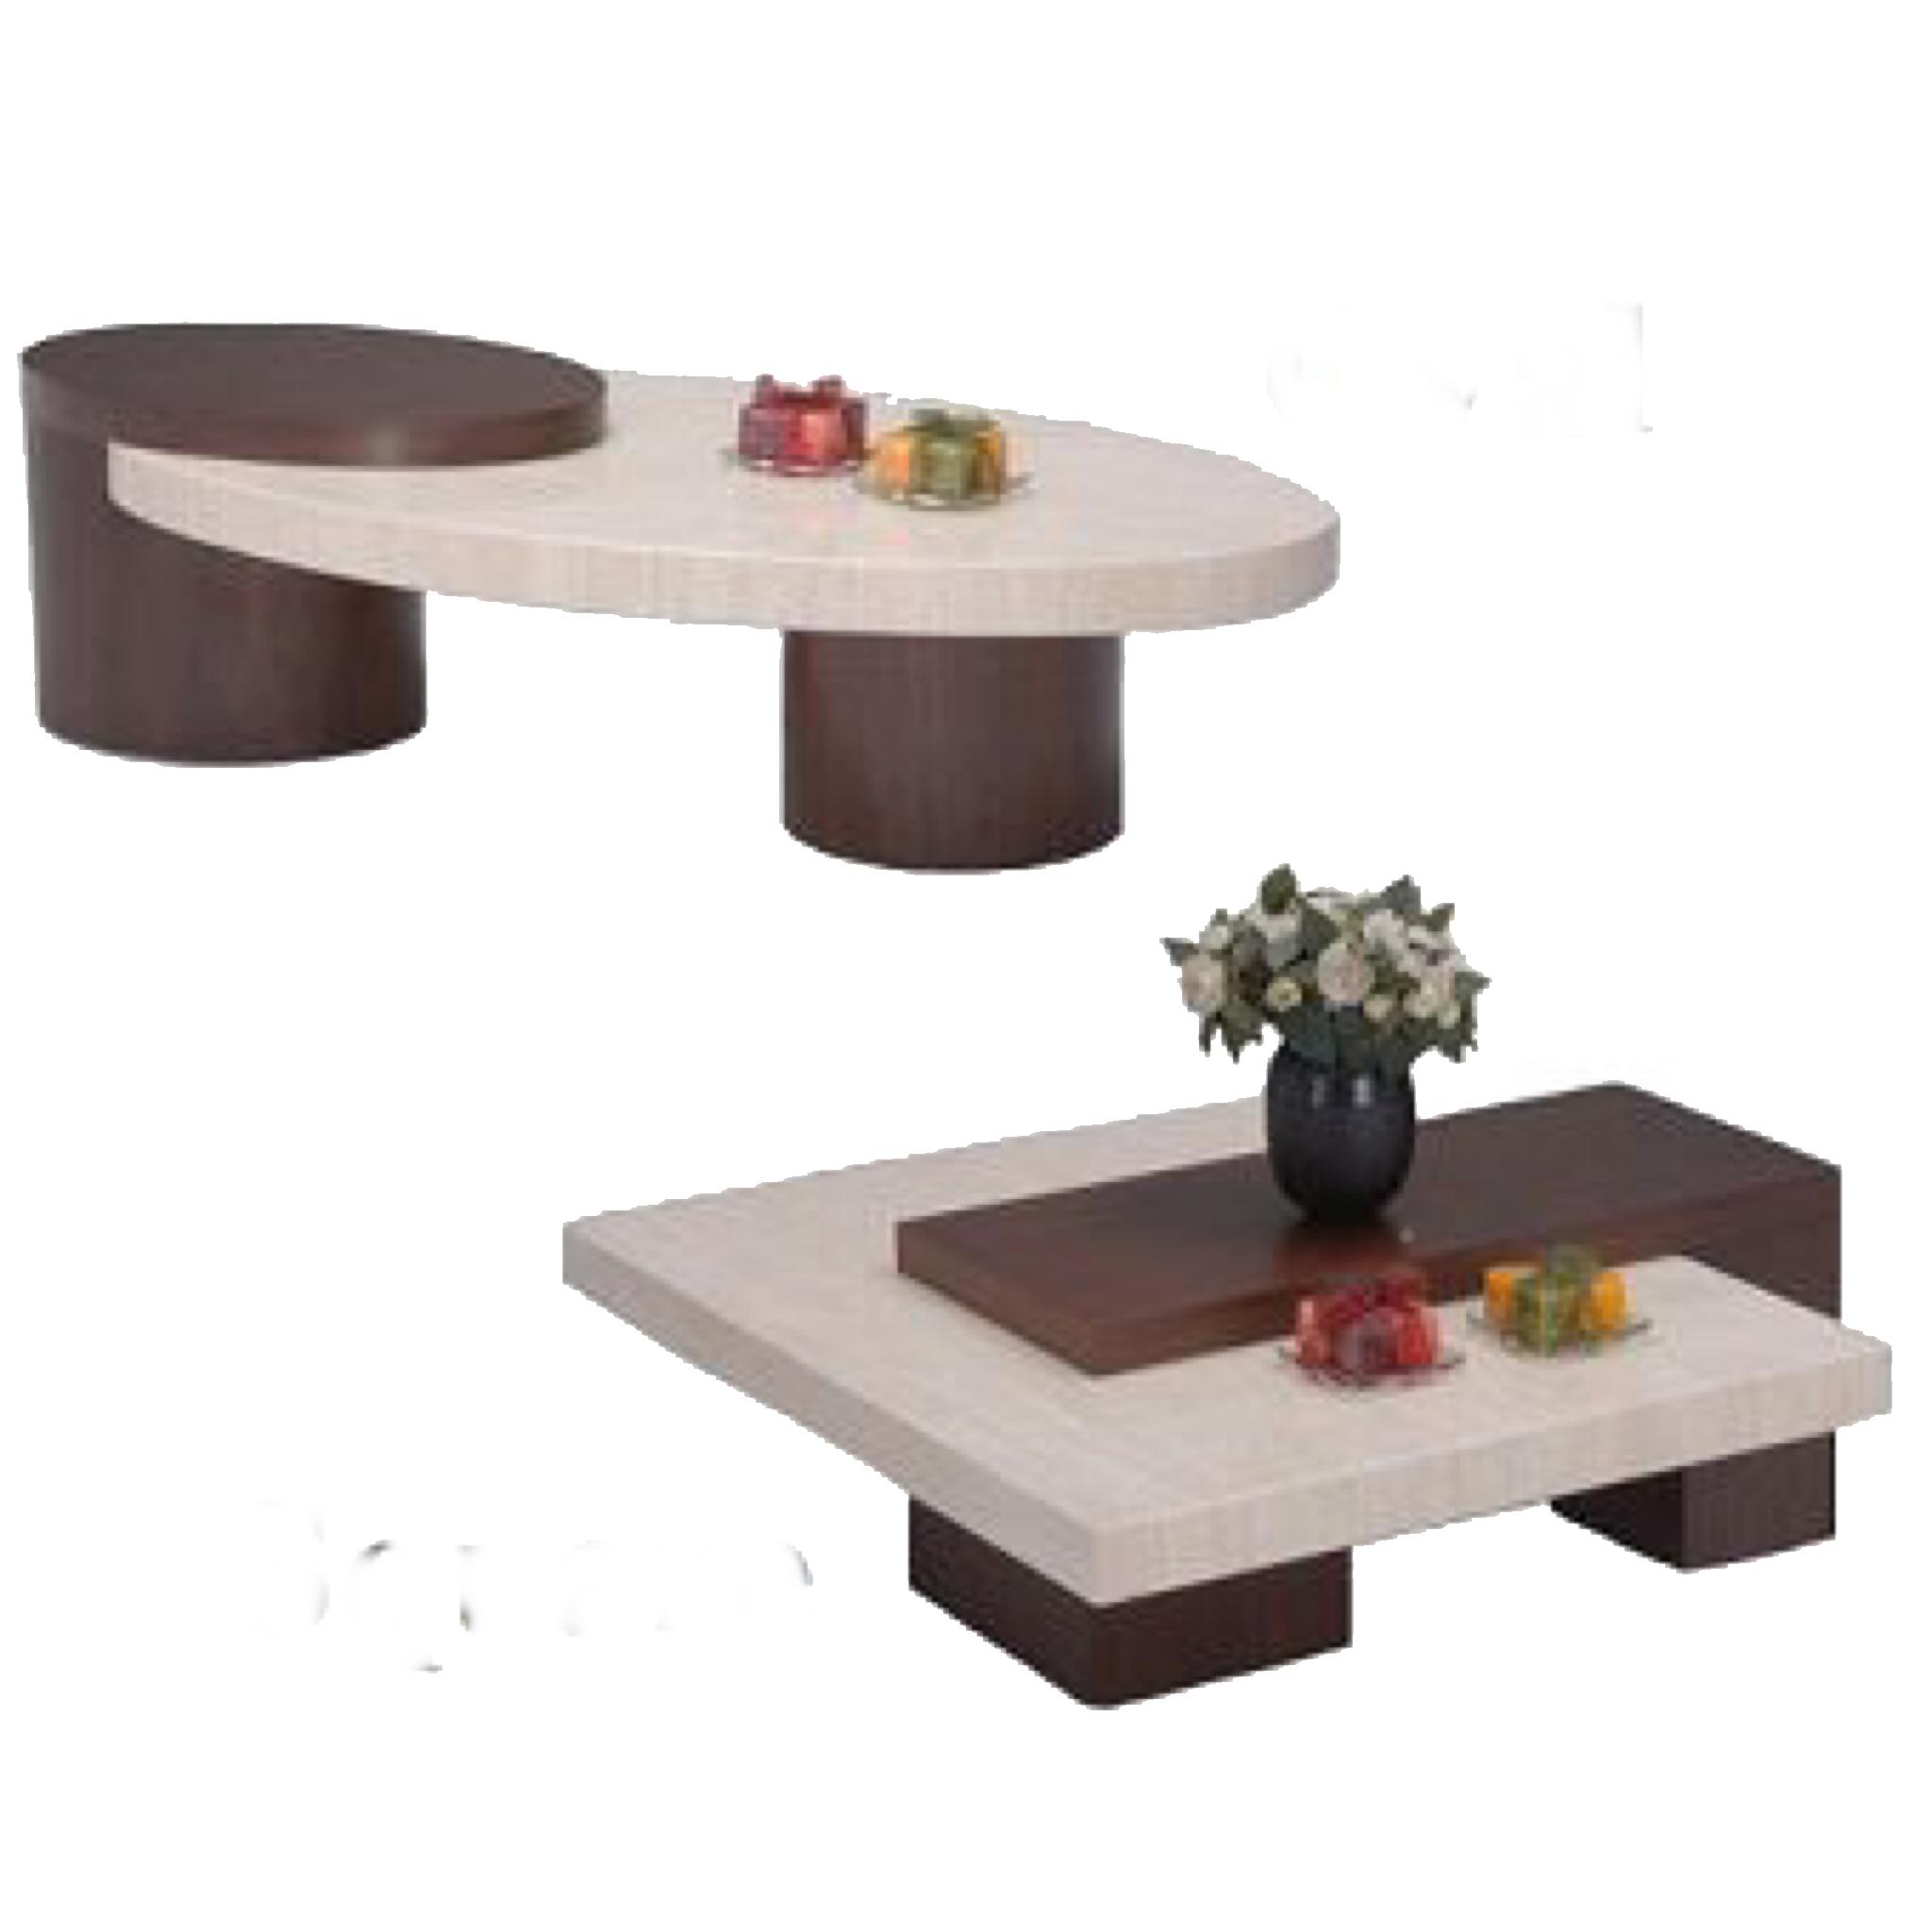 Pin De Orle Nunez Em Centre Table Design De Moveis Moveis Modernos Decoracao [ 2048 x 2048 Pixel ]